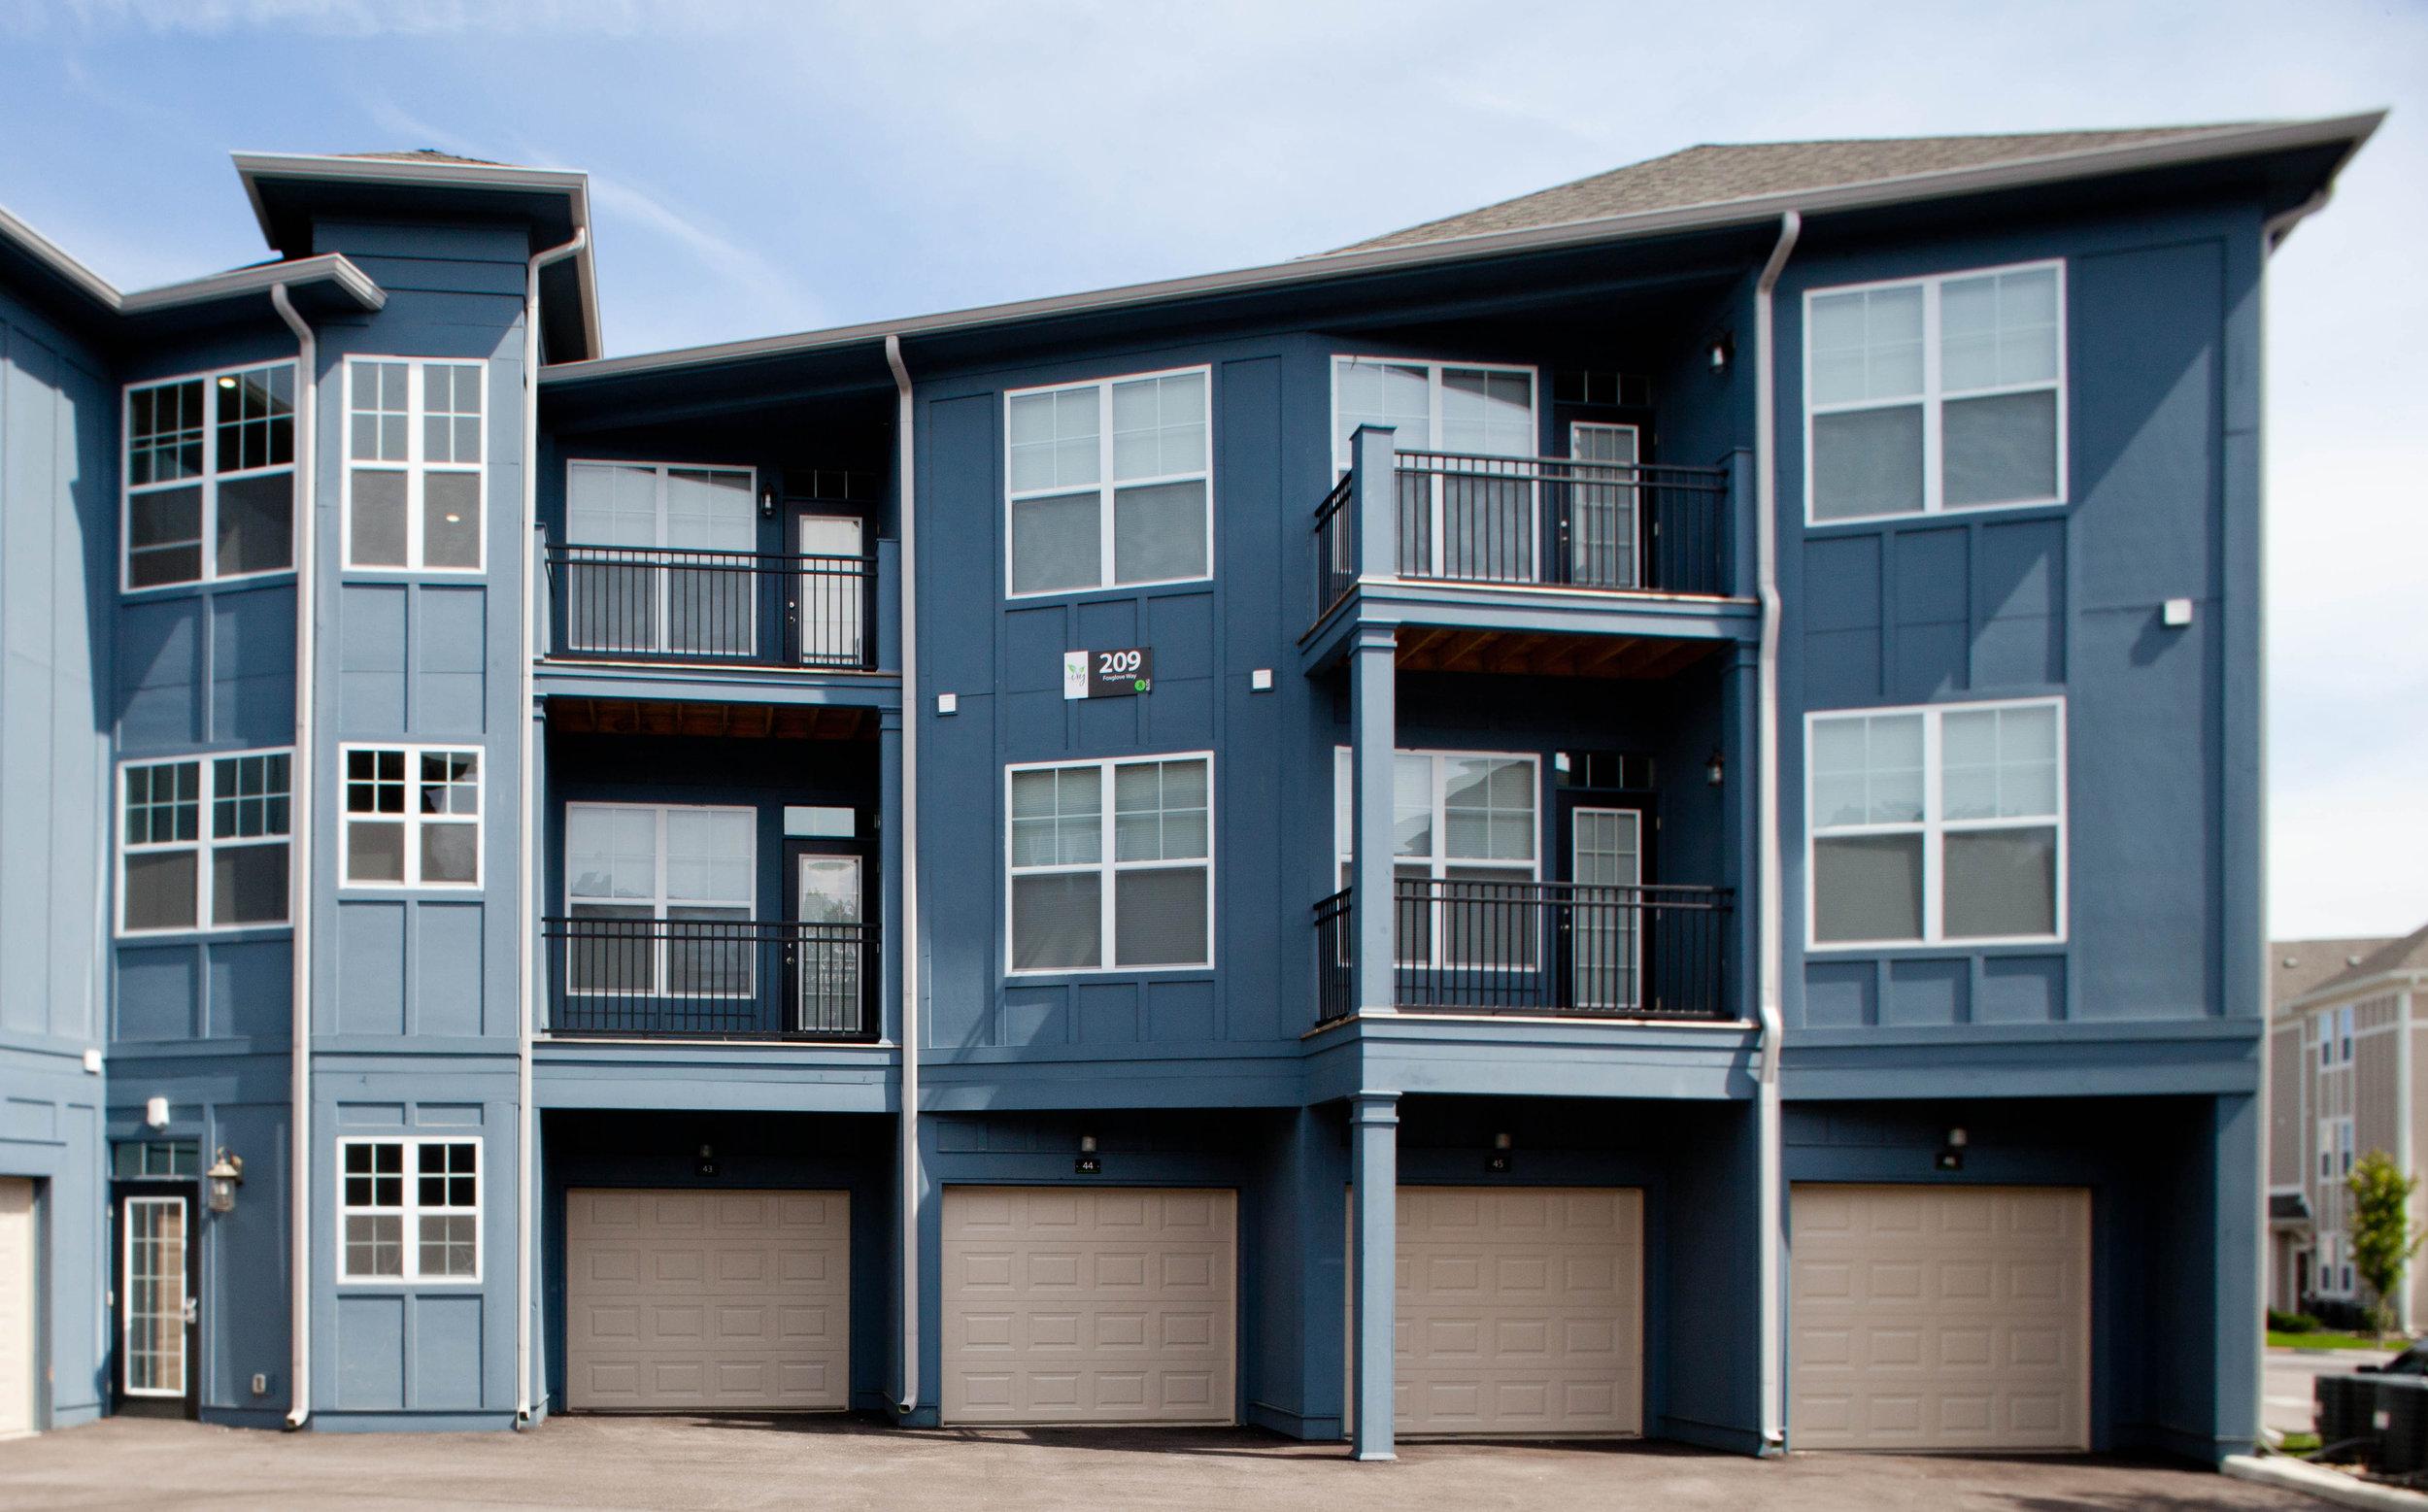 Ivy - attached garage (apartments).jpg